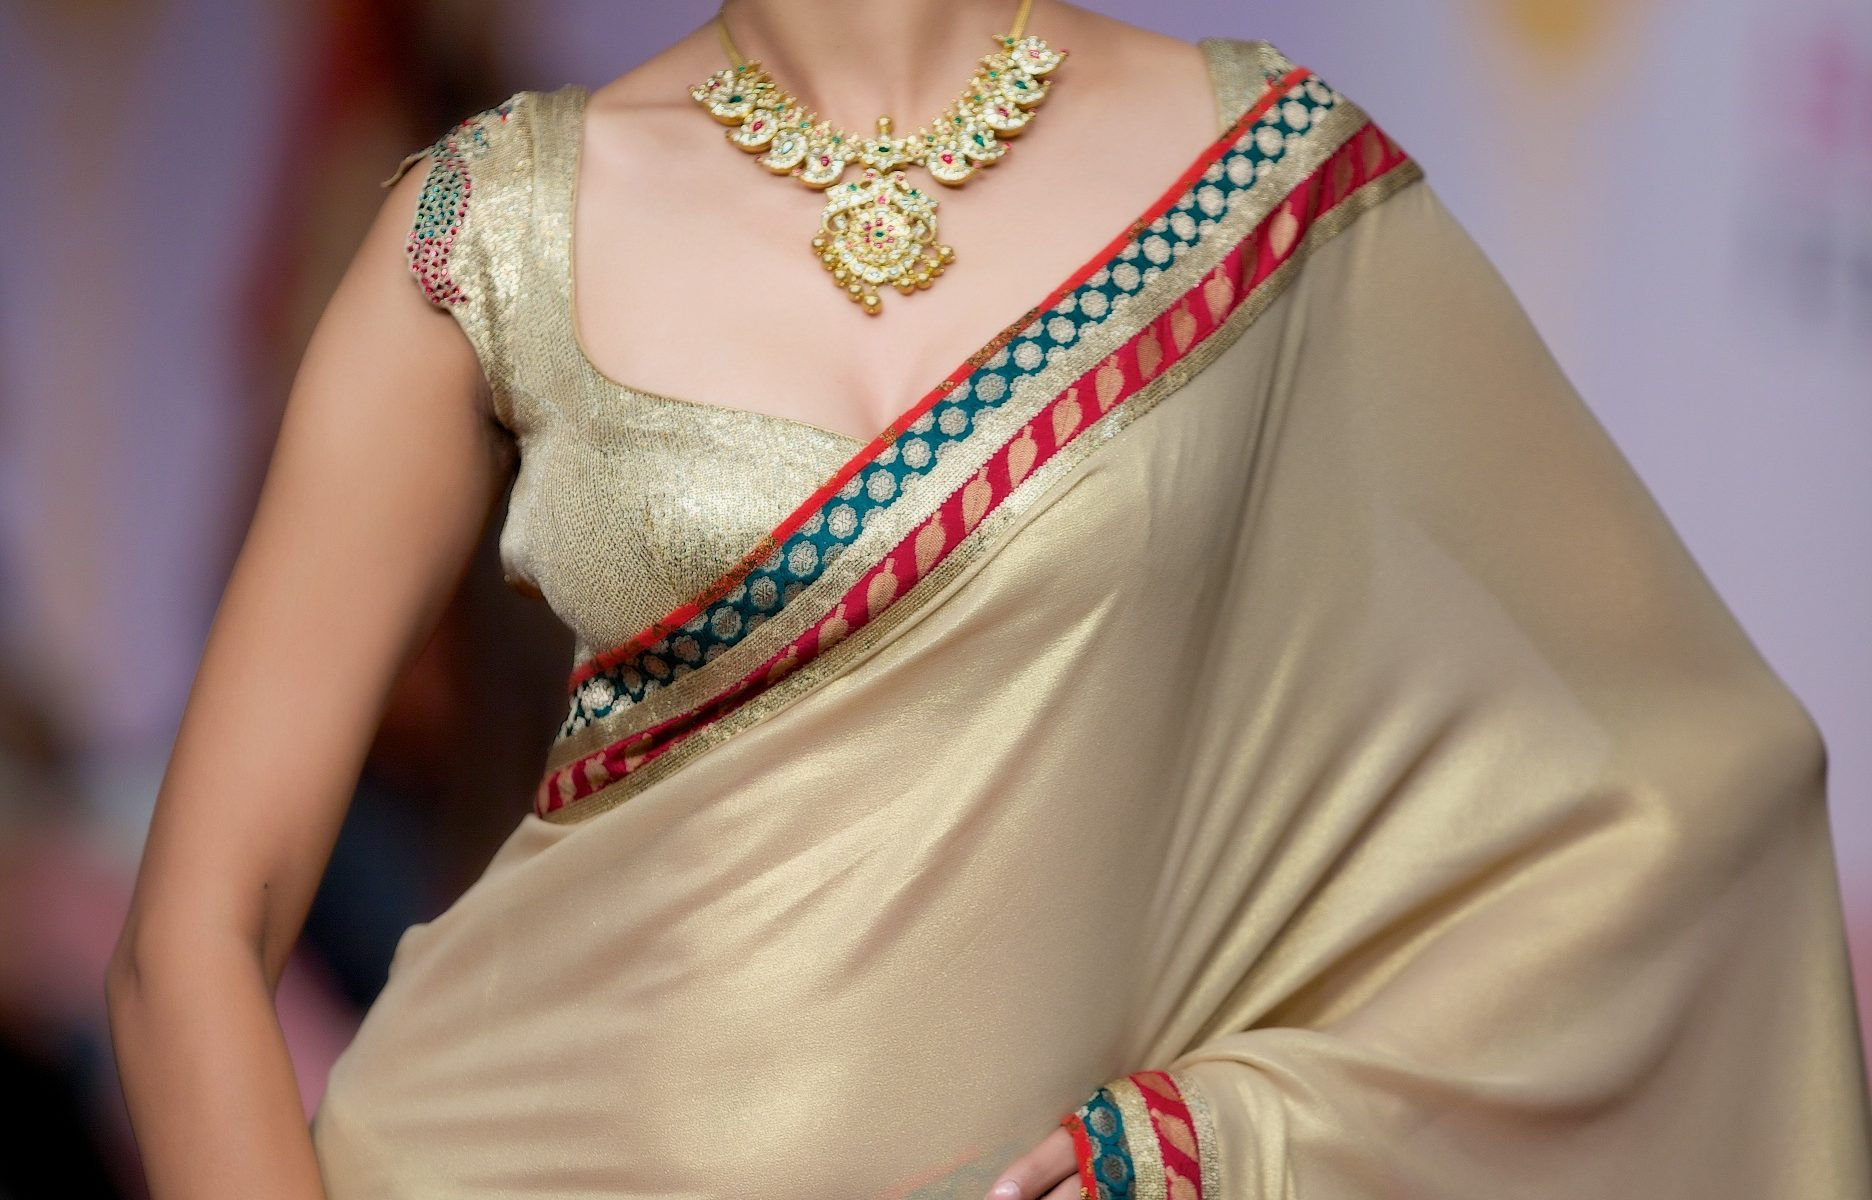 Fashion Industry Boost Digital Photographers